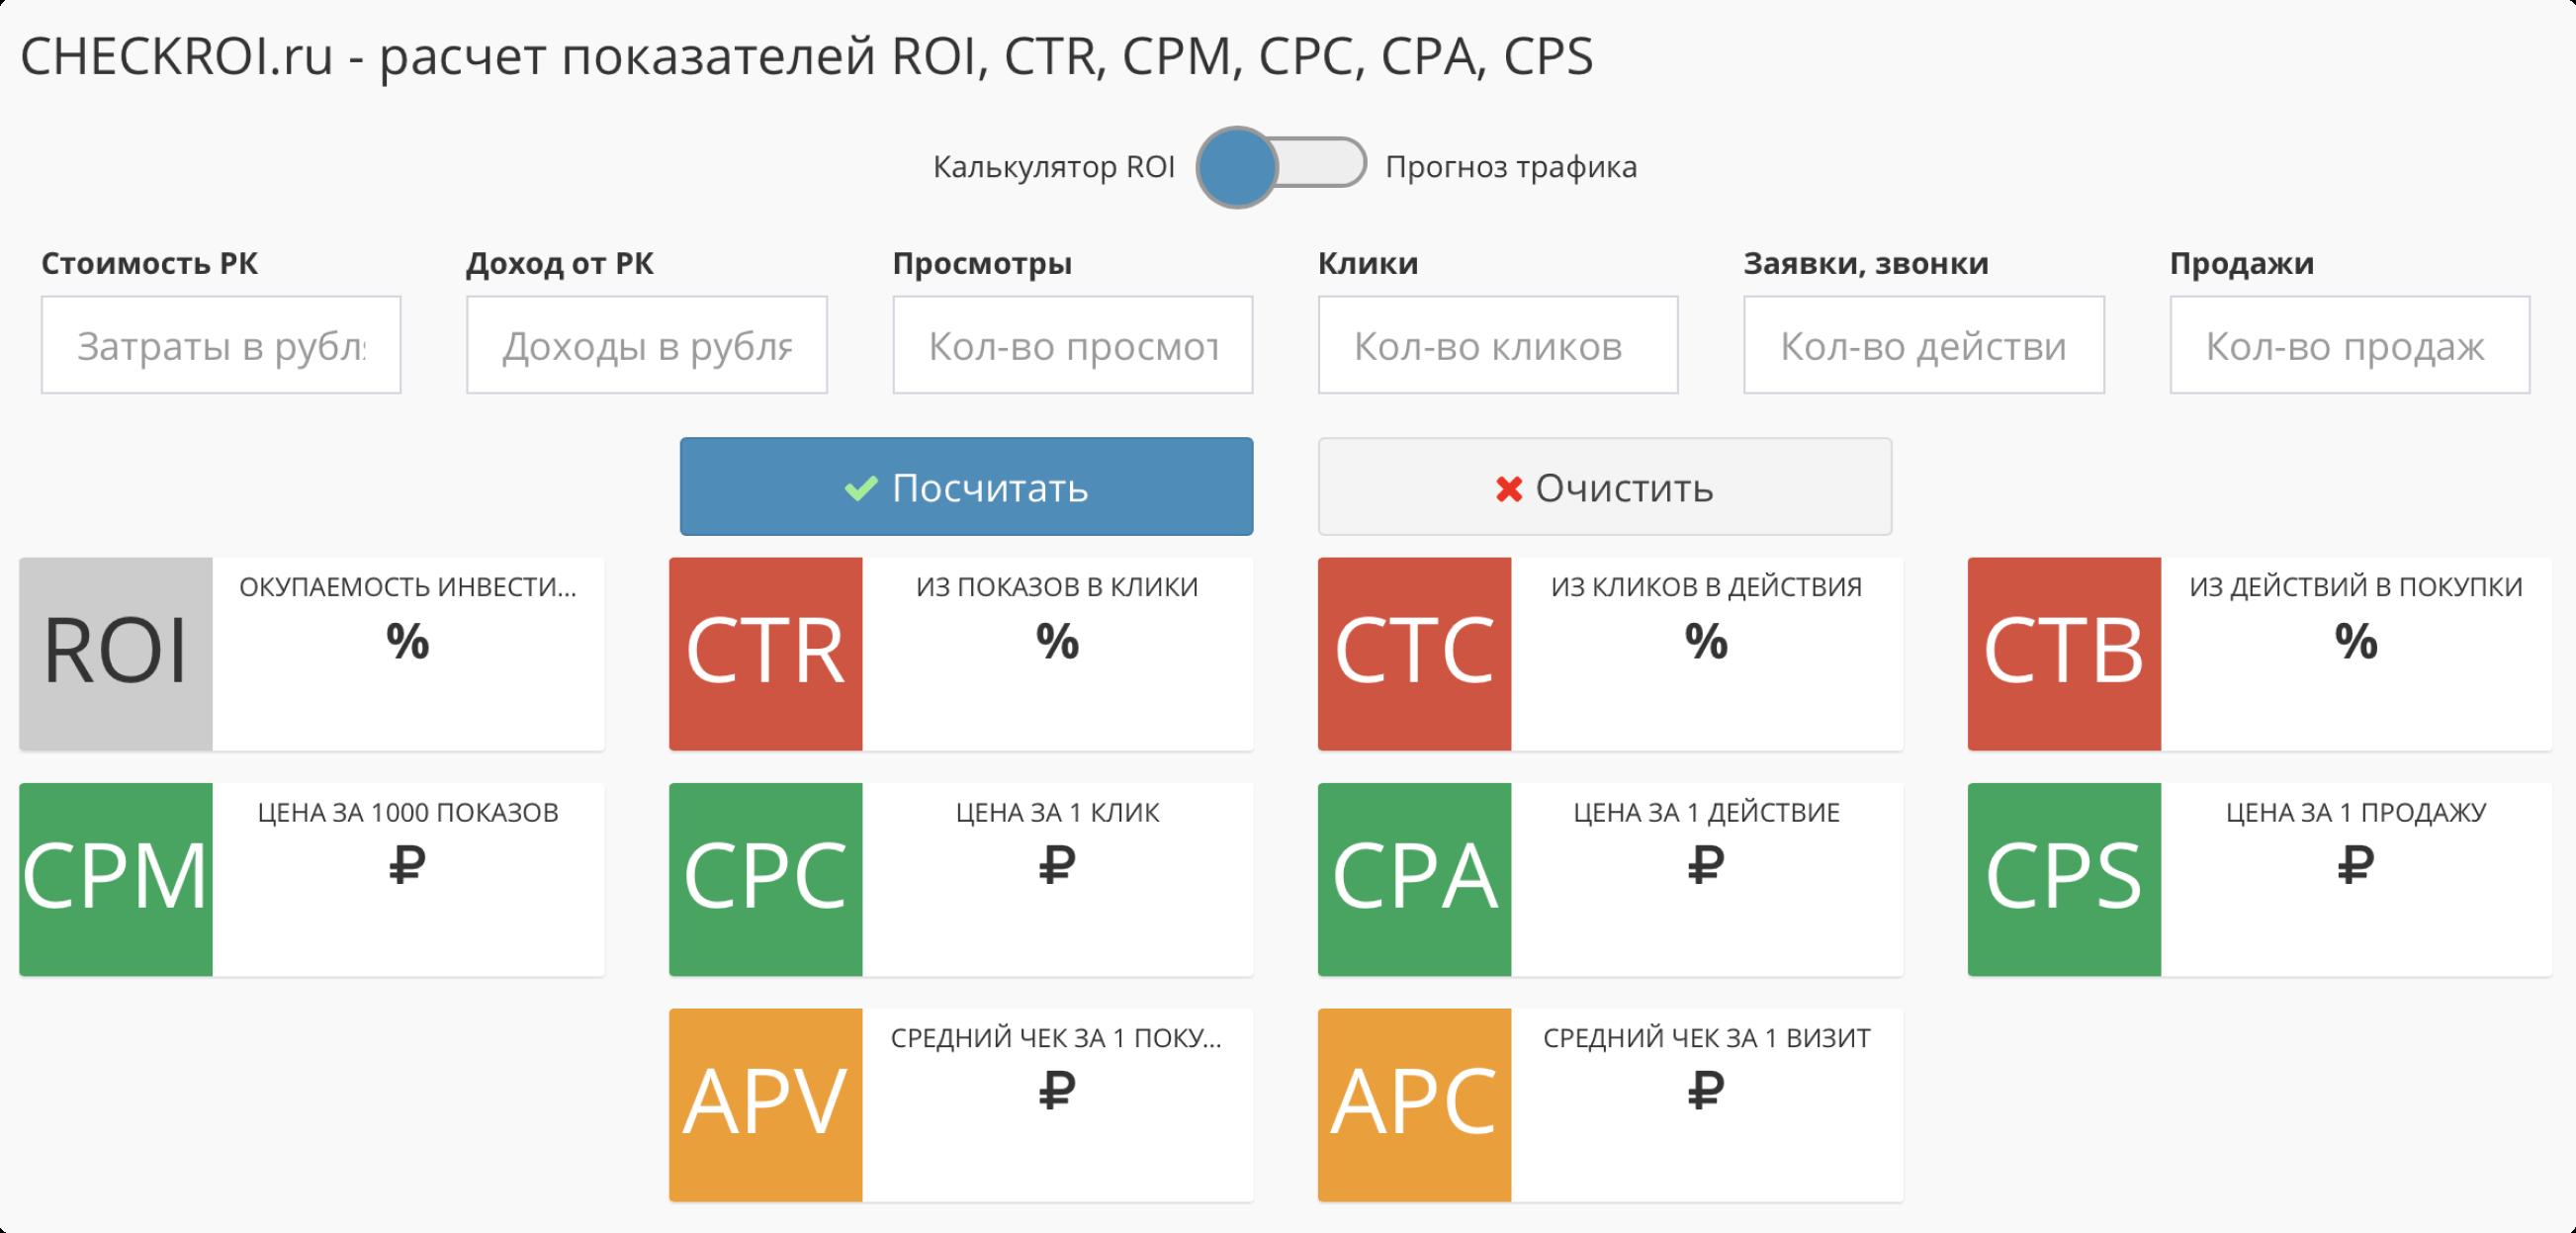 Интерфейс CHECKROI для расчета показателей ROI, CTR, CPM, CPC. CPA. CPS